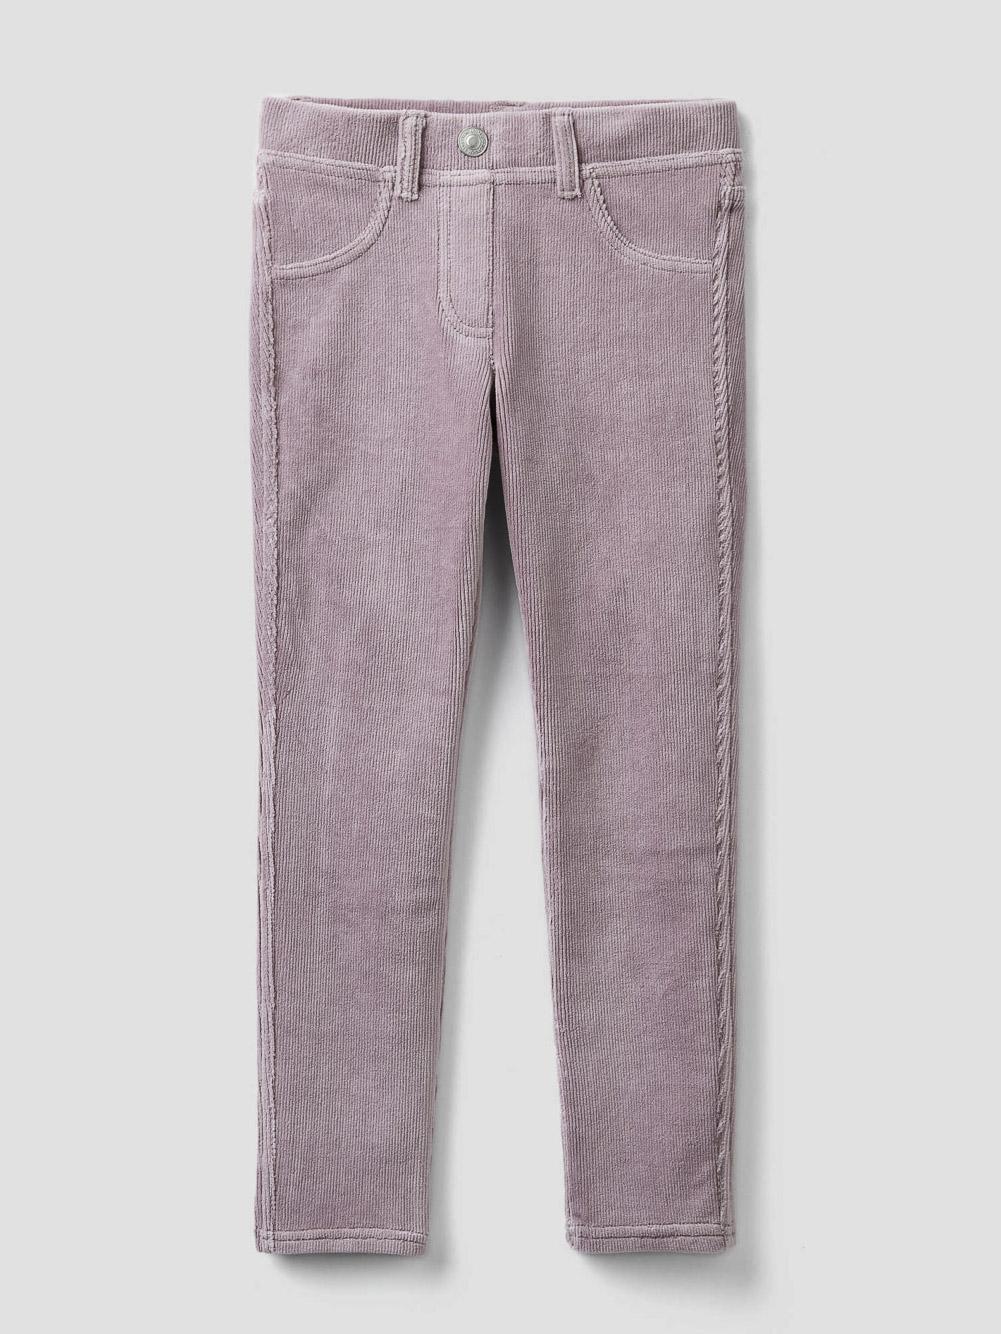 012 BENETTON Παντελόνι super skinny 4DZB57LZ0 20A2C5